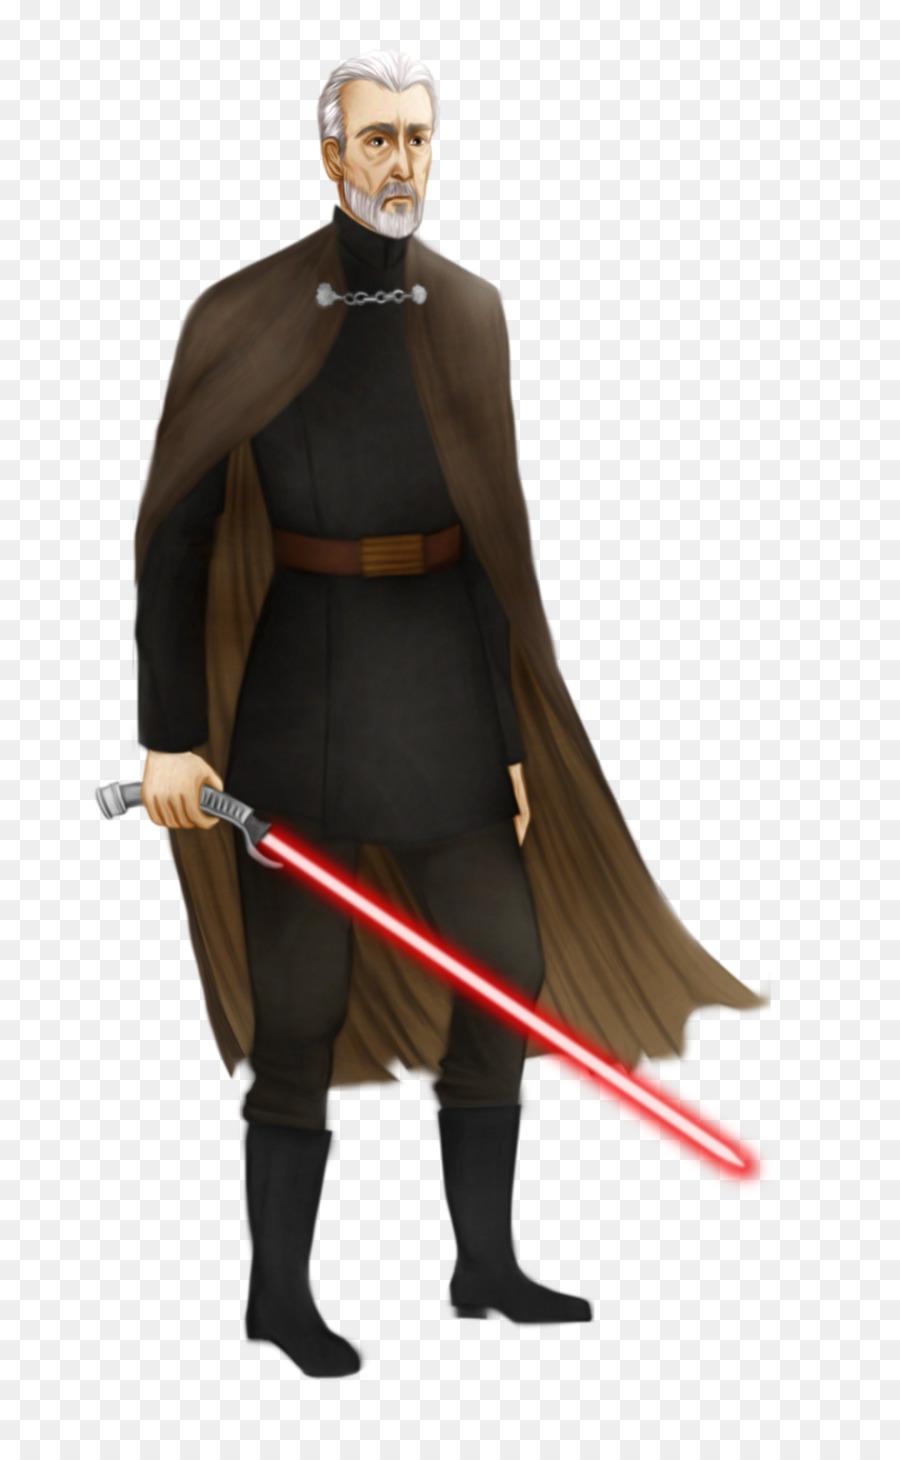 count dooku anakin skywalker star wars the clone wars obi wan kenobi darth vader